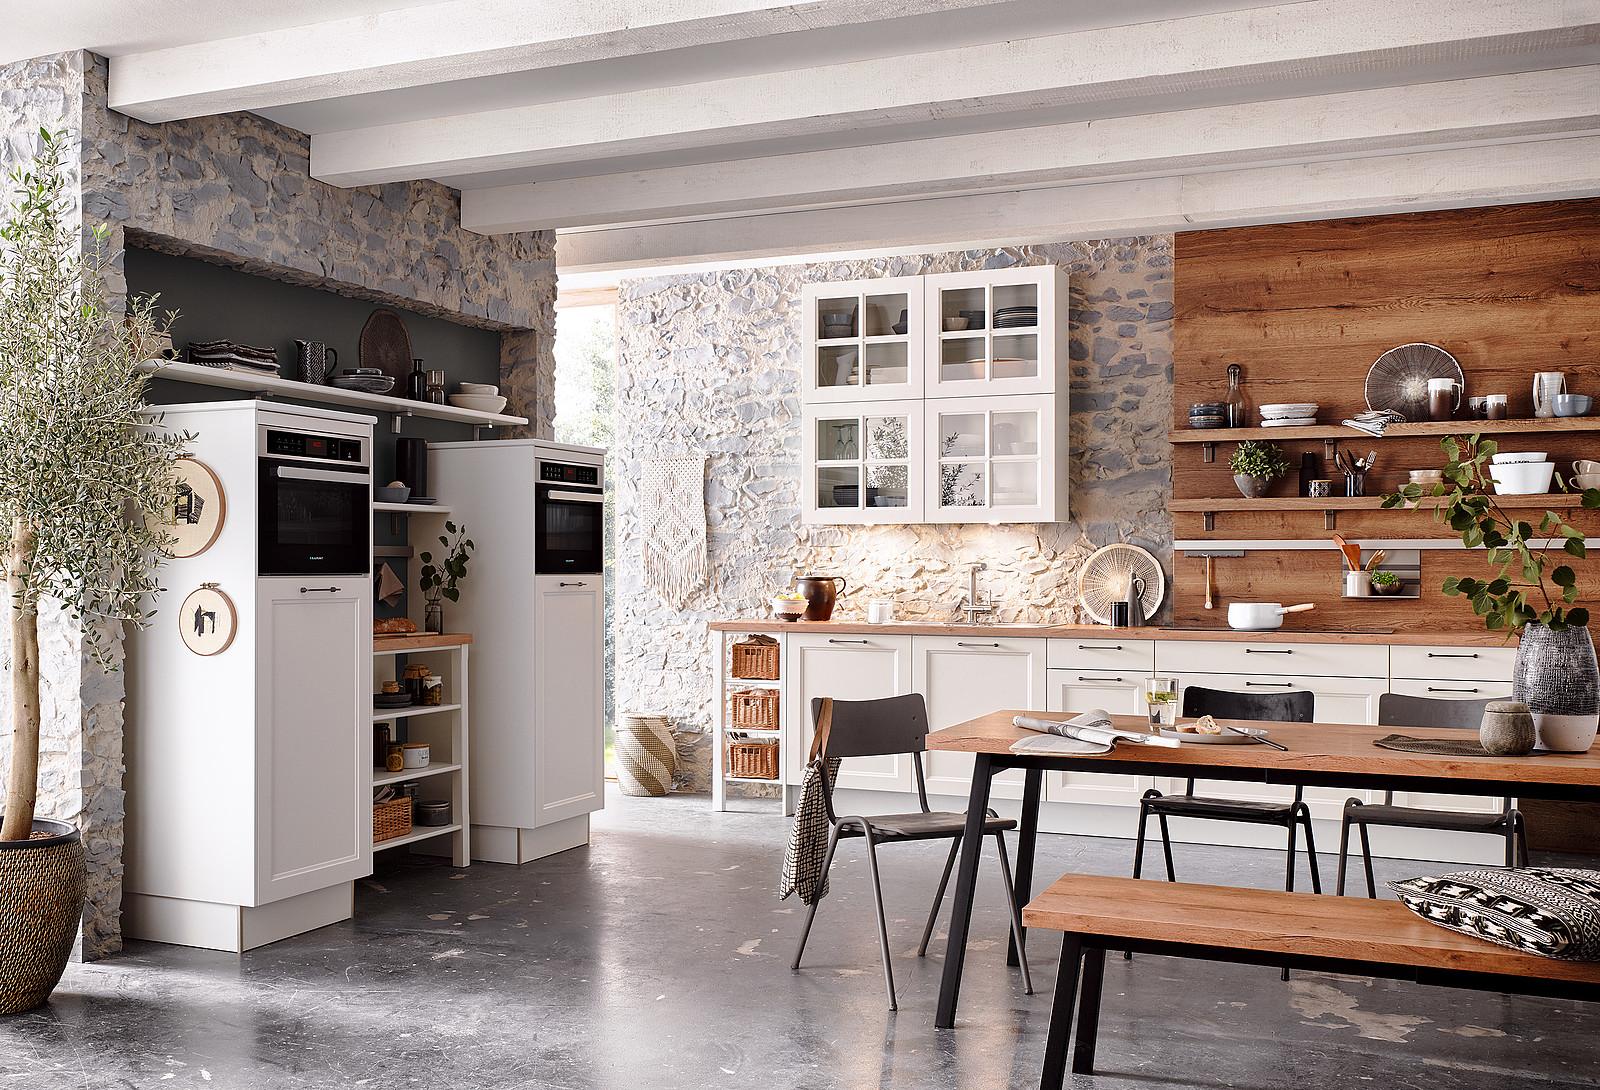 Full Size of Bodenbelag In Küche Bodenbeläge Küche Vinyl Bodenbelag Küche Poco Rutschfester Bodenbelag Küche Küche Bodenbelag Küche